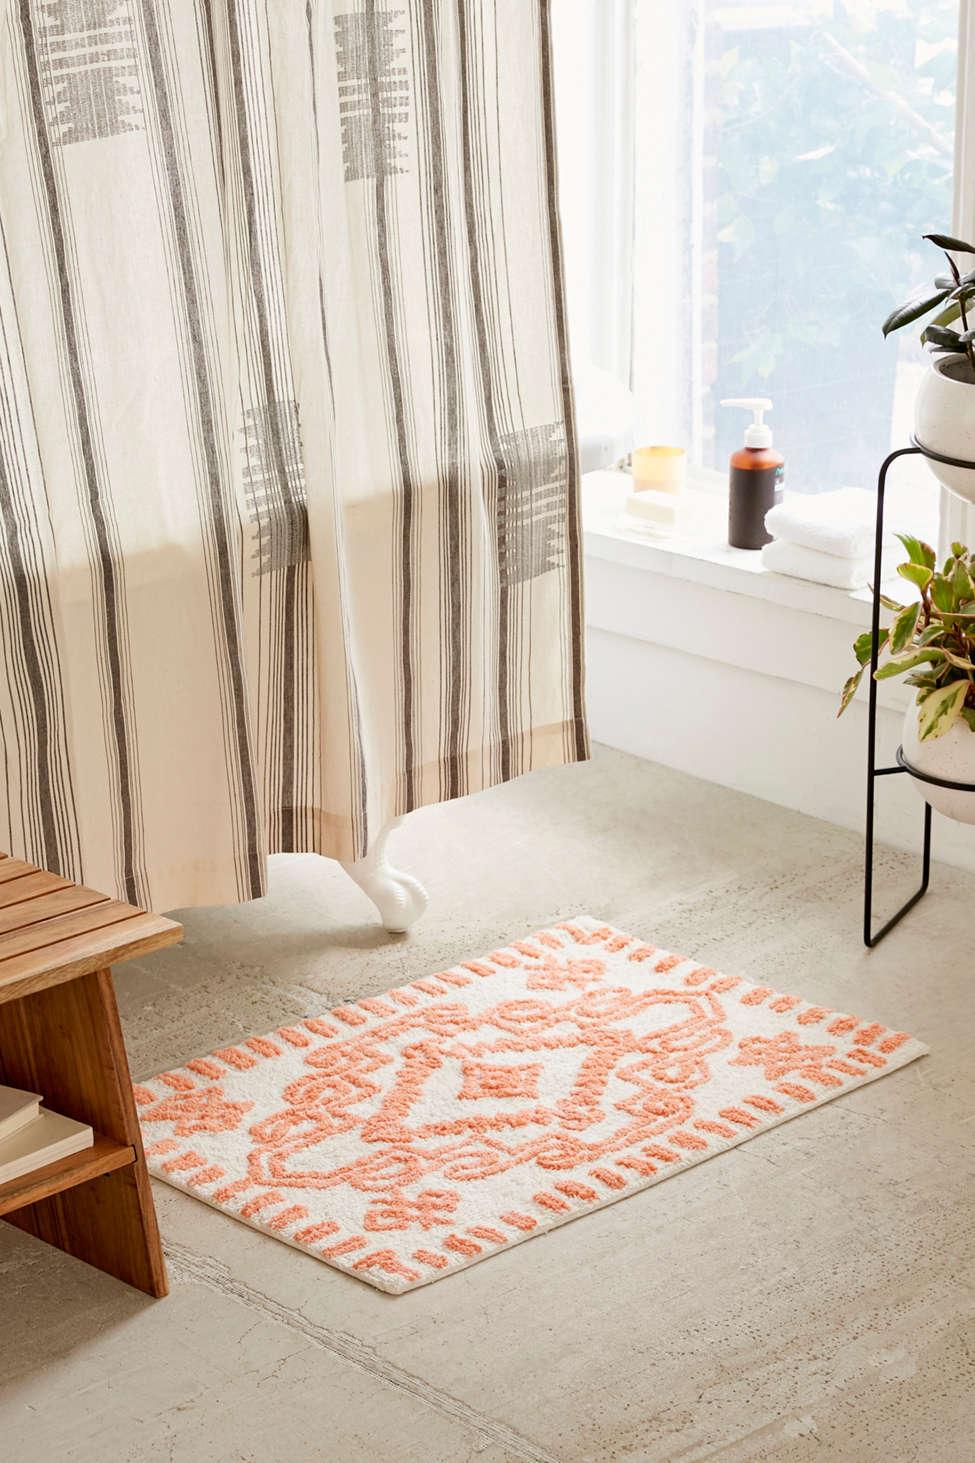 Global Style Bath Rugs From Safari And Coastal Plus